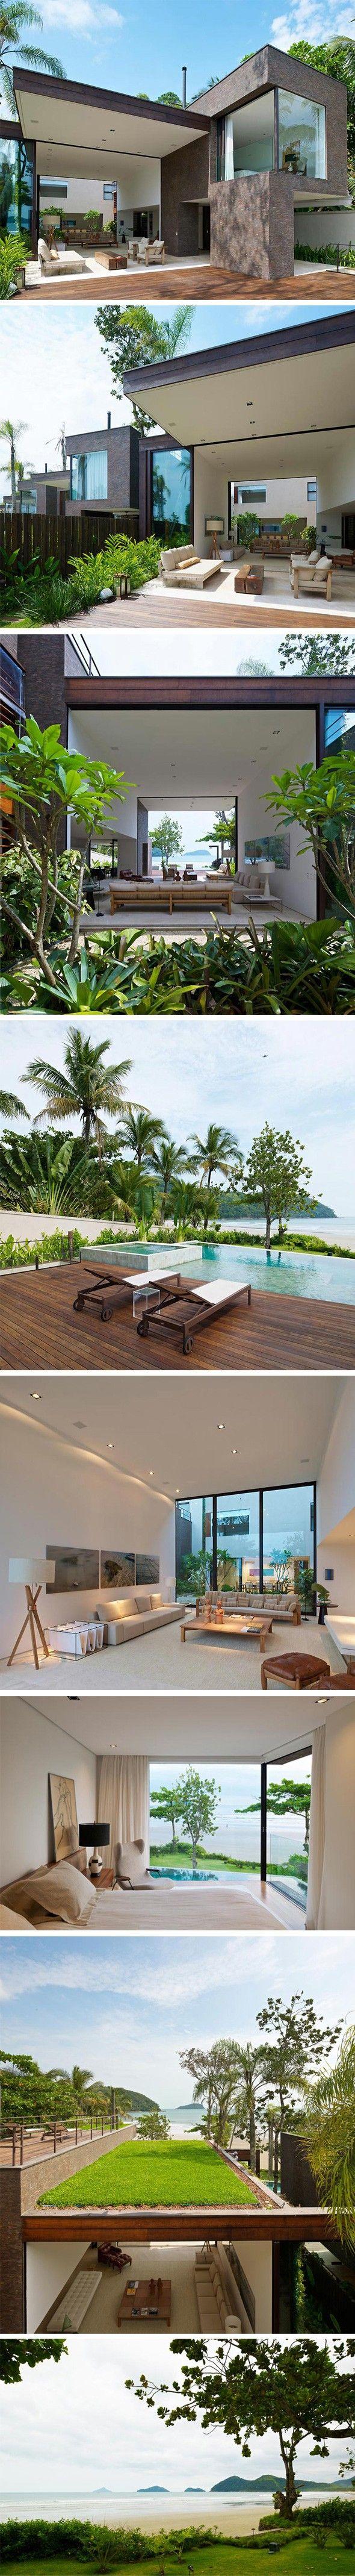 Baleia Residences by Studio Arthur Casas - Journal of Design